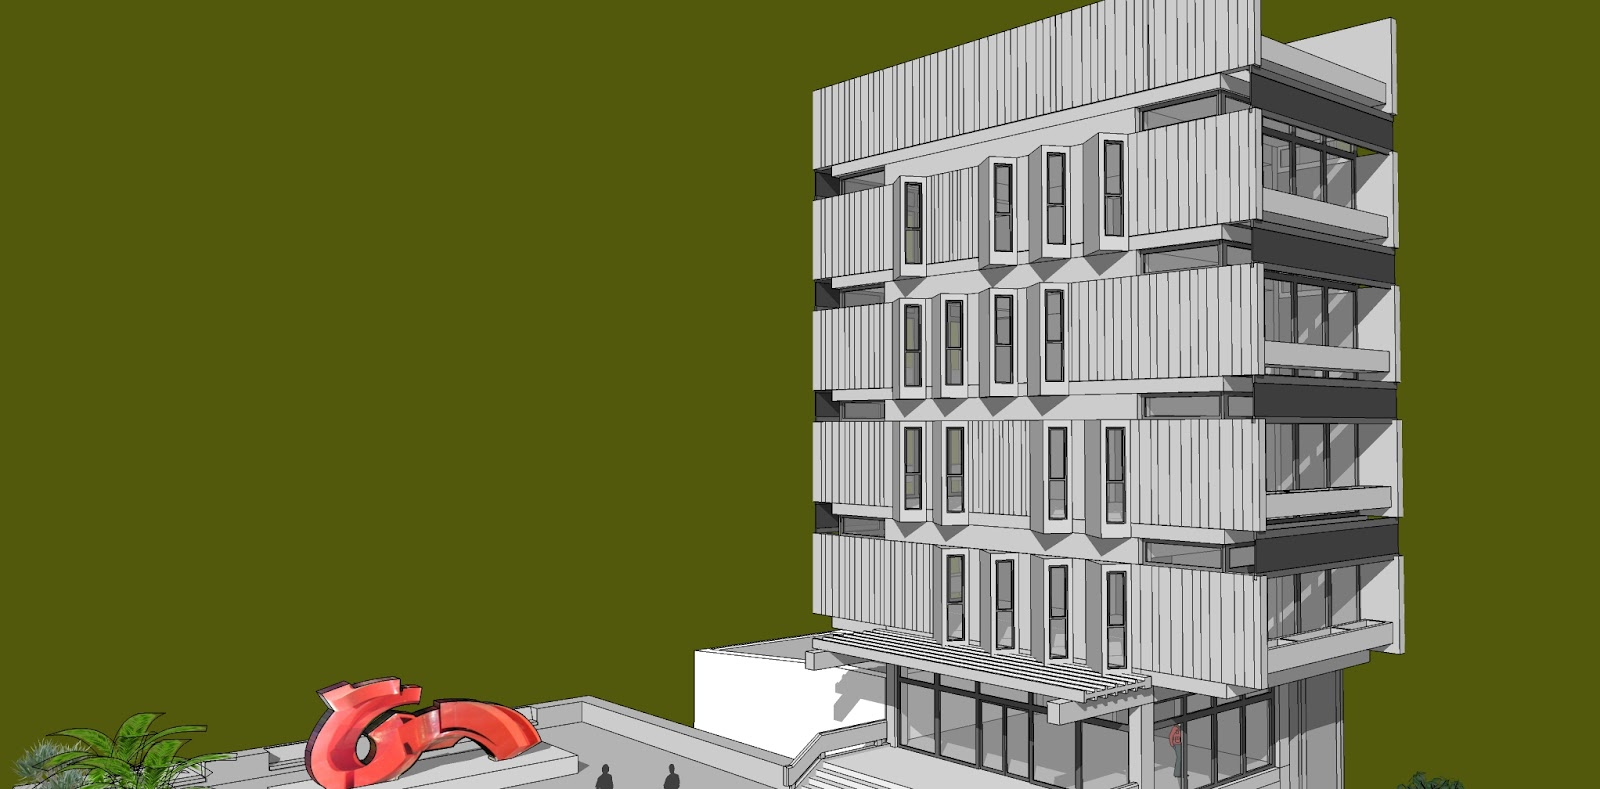 Arquitectura hist rica en tenerife espa a colegio de - Colegio arquitectos canarias ...